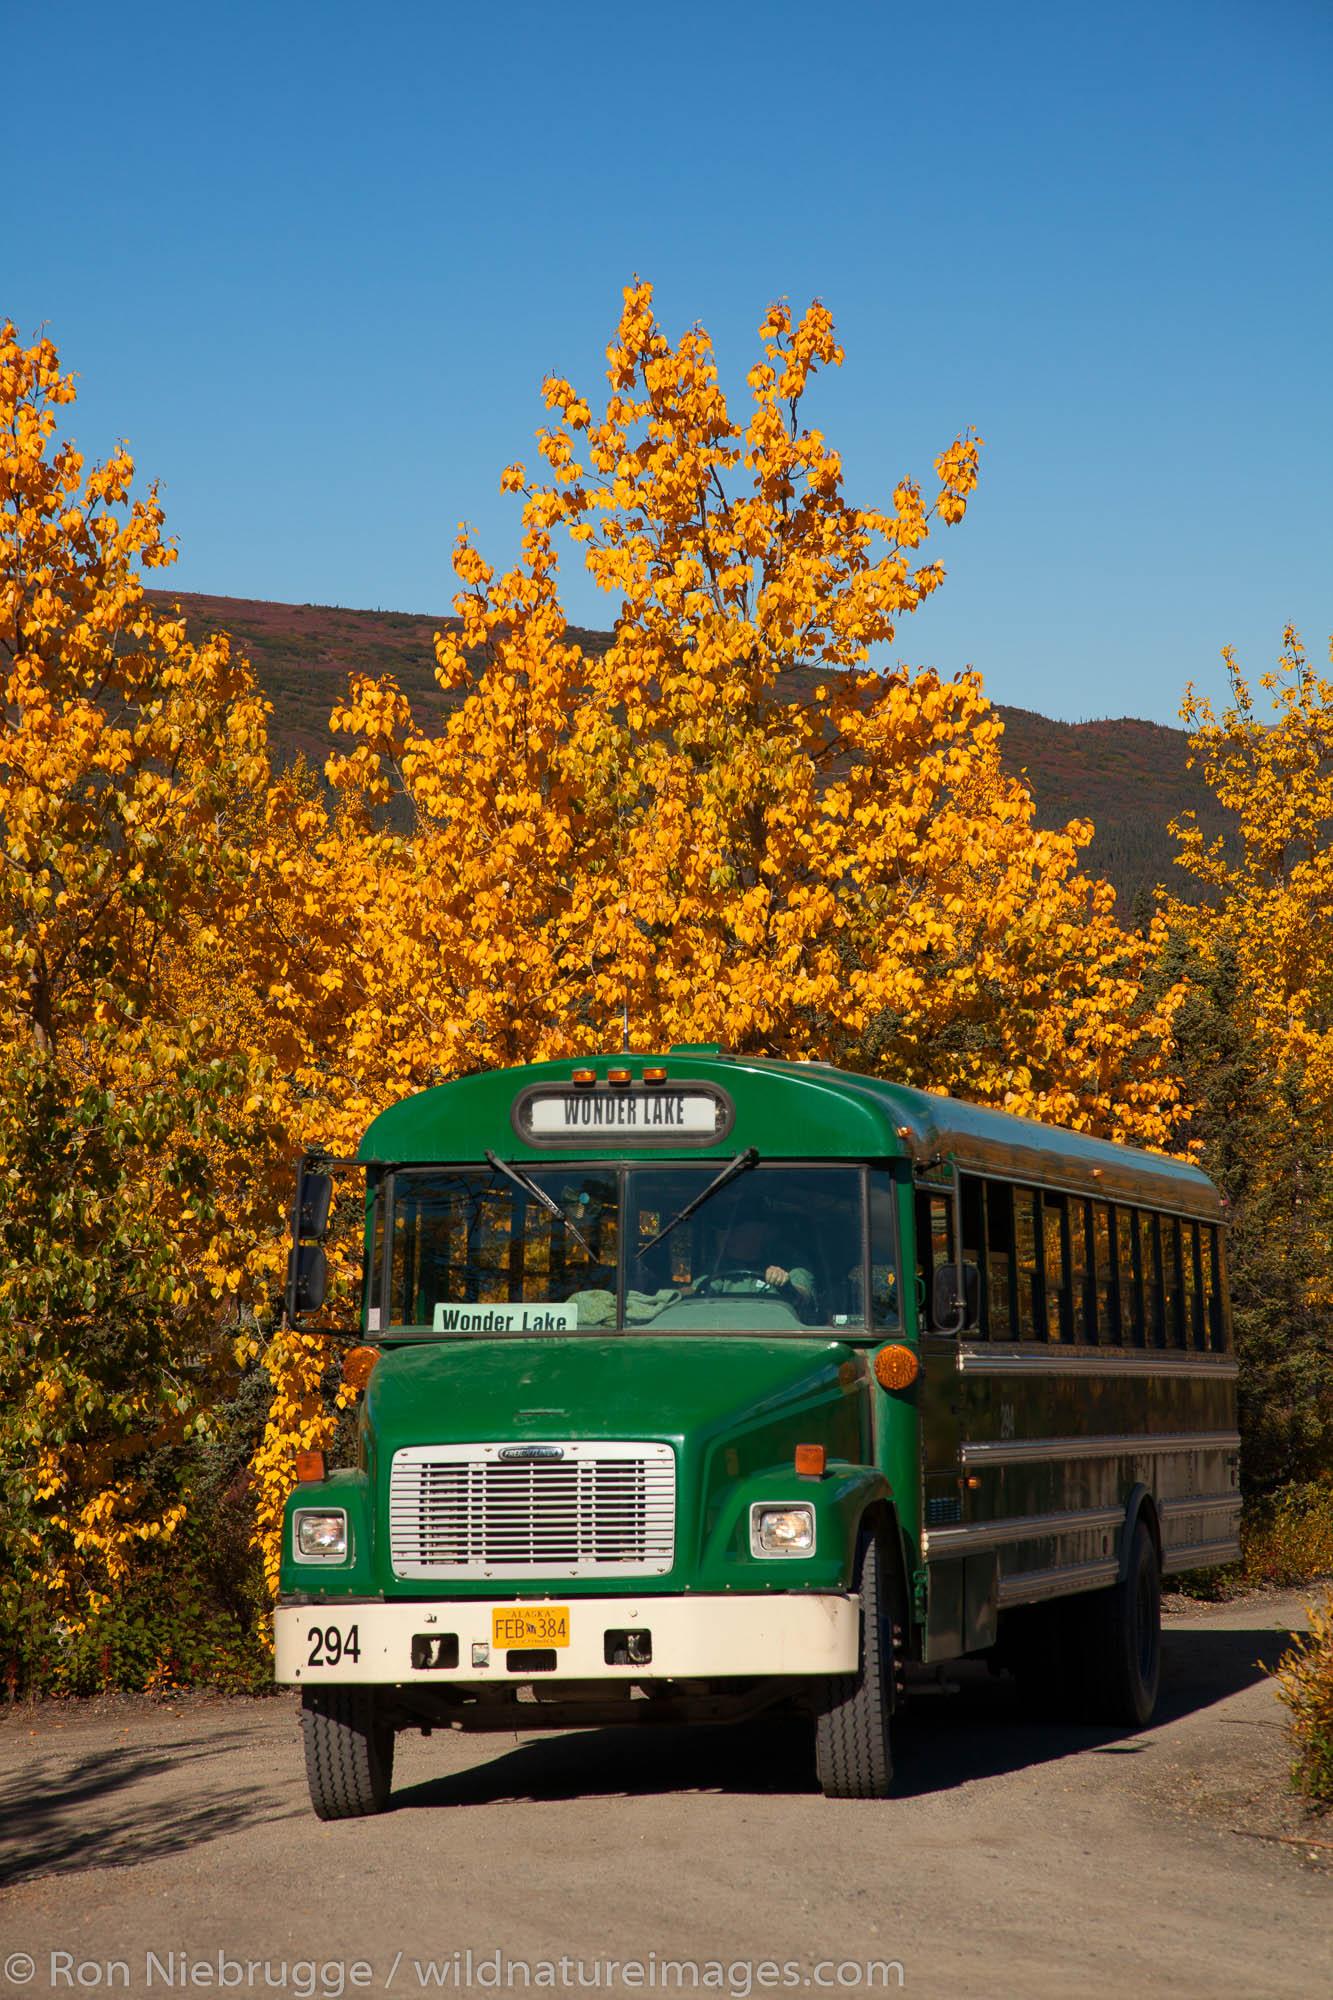 Camper Bus at the Wonder Lake campground, Denali National Park, Alaska.